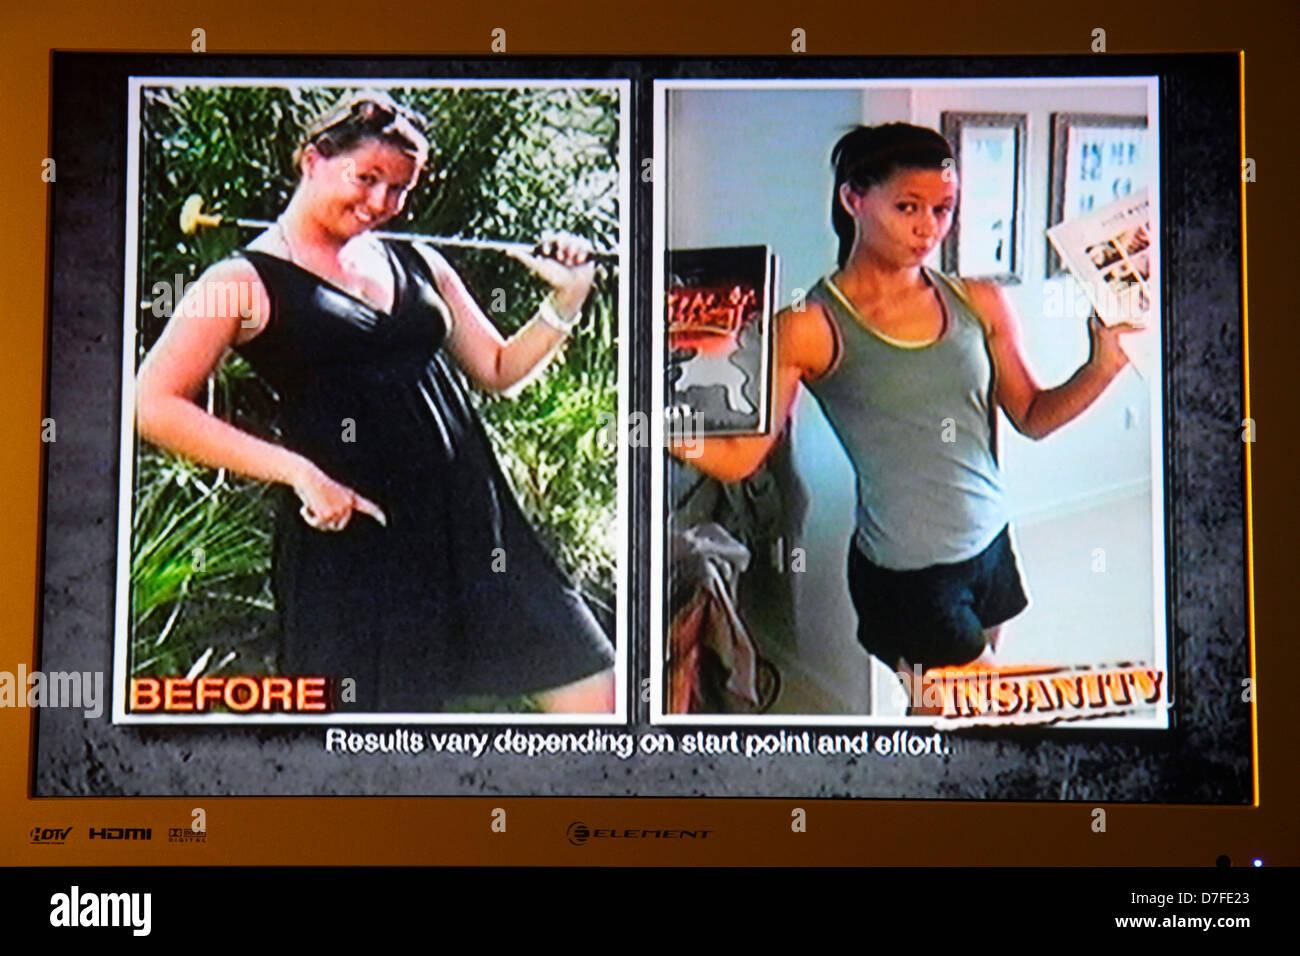 Miami Beach Florida television TV flat screen monitor ad advertising commercial telemarketing Insanity fitness program - Stock Image